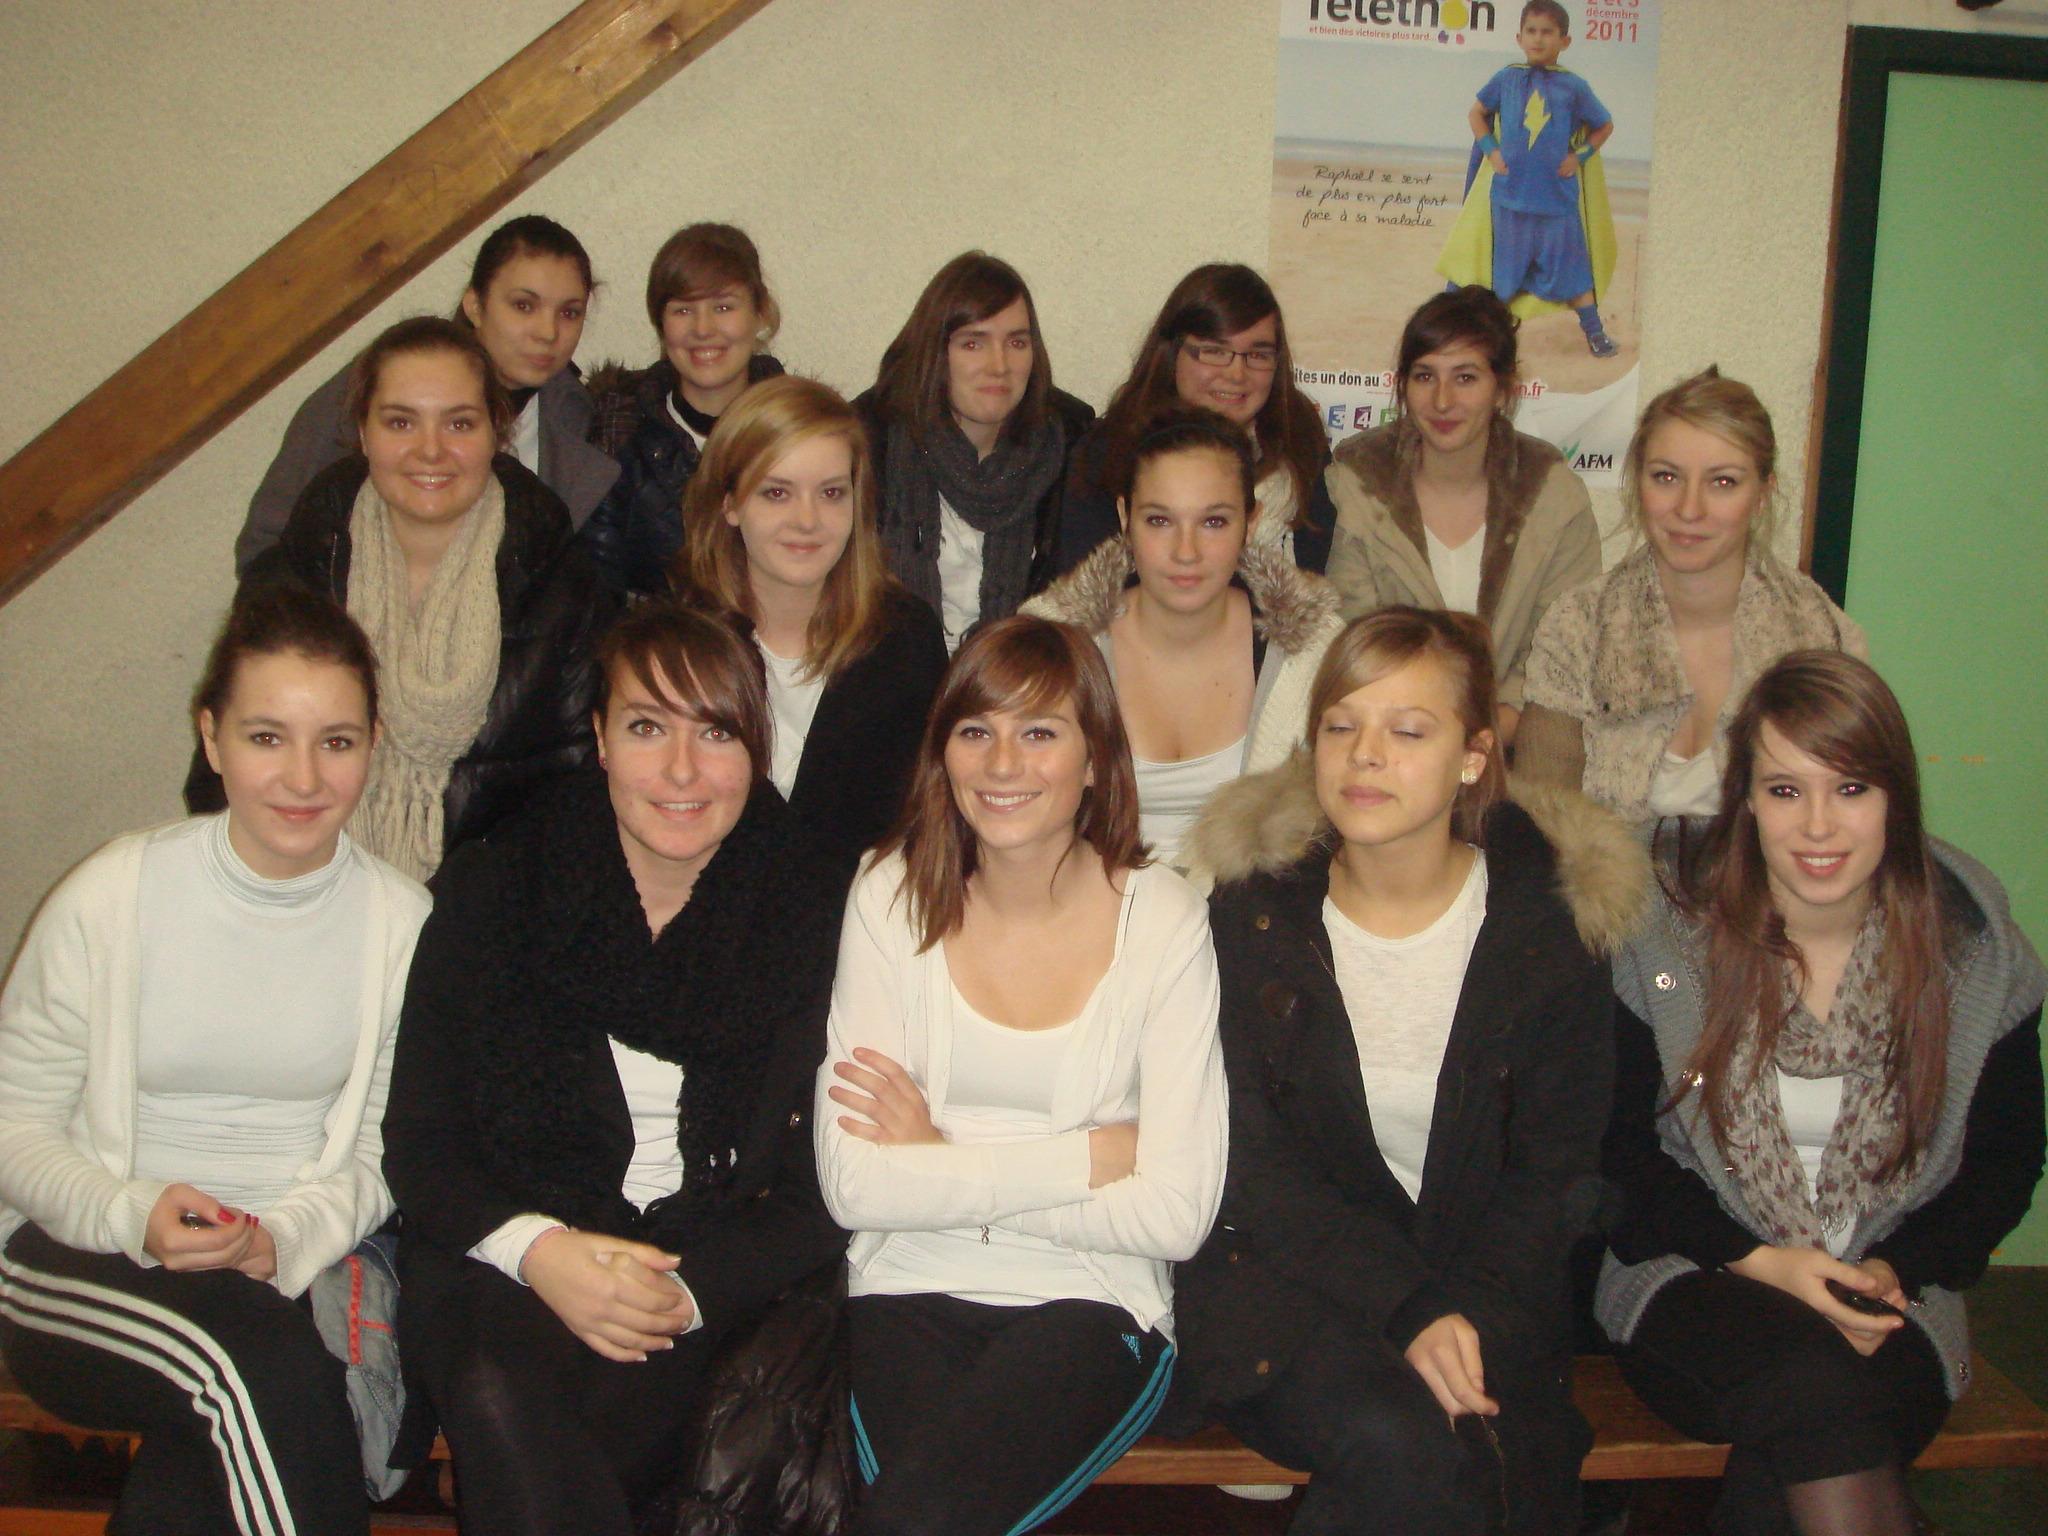 2011-12-04-loperhethon-2011-027